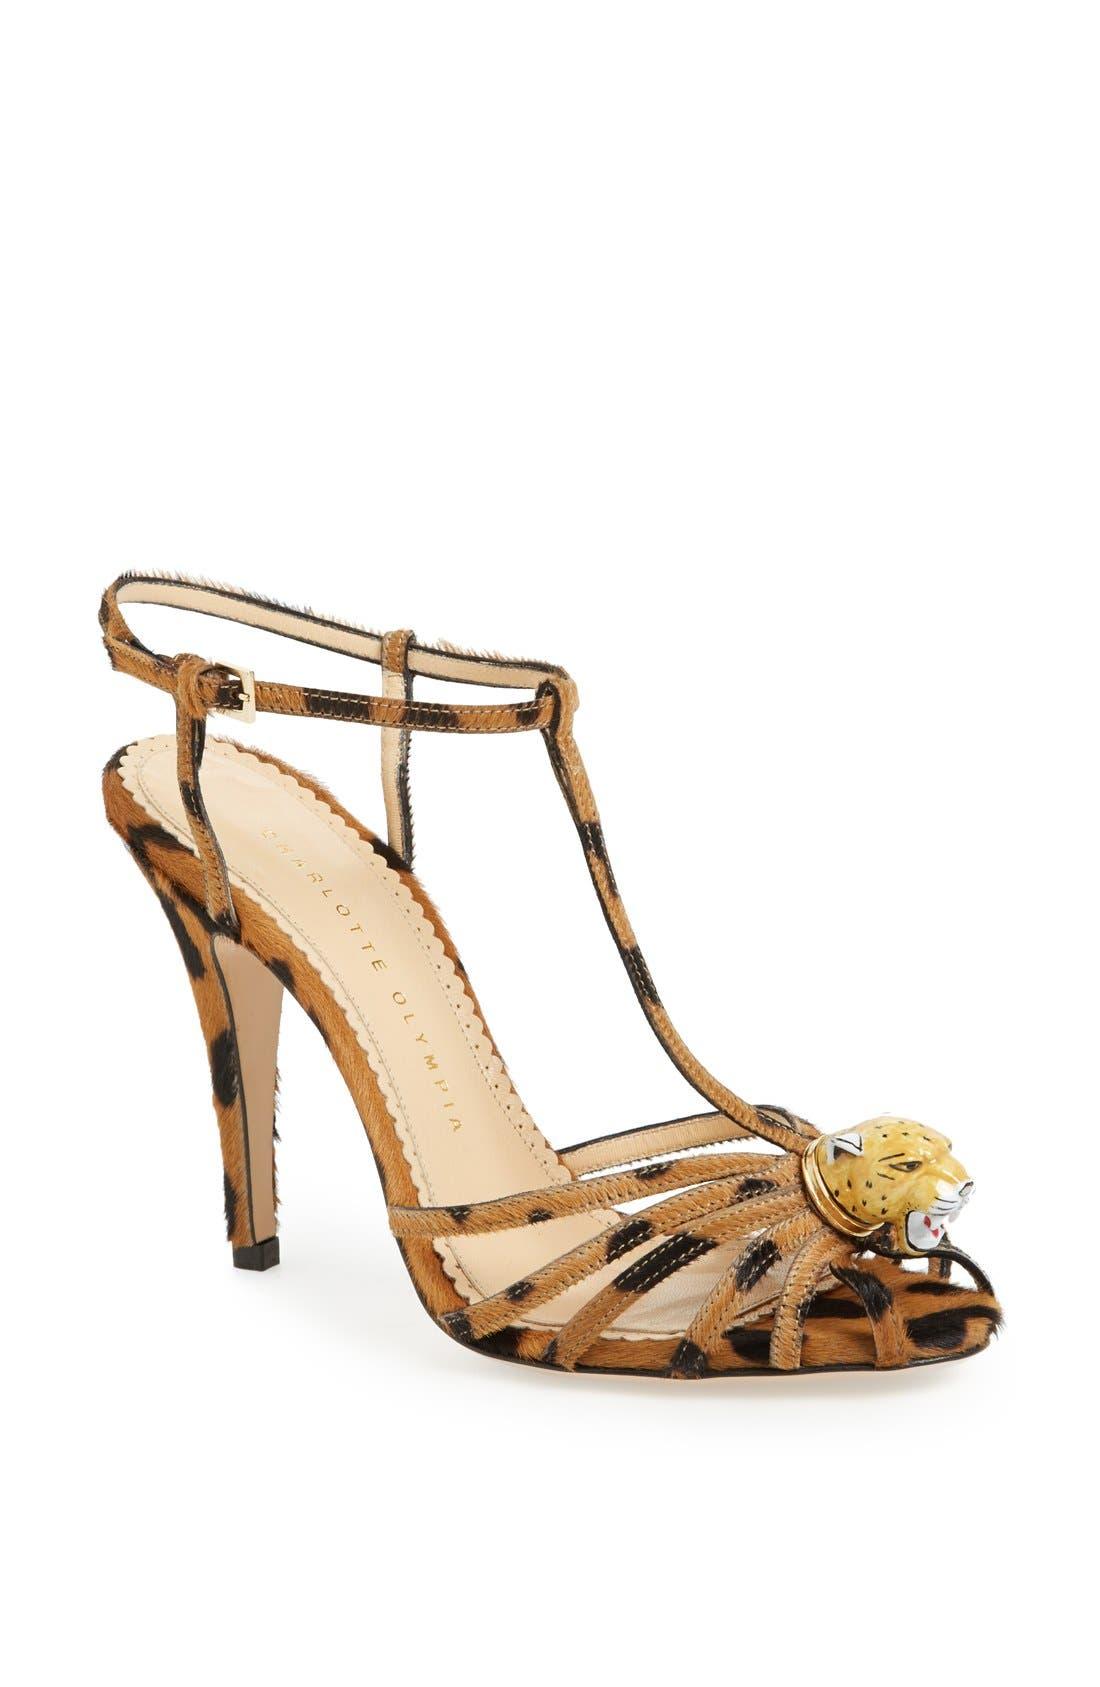 Alternate Image 1 Selected - Charlotte Olympia 'Clio' Calf Hair Sandal